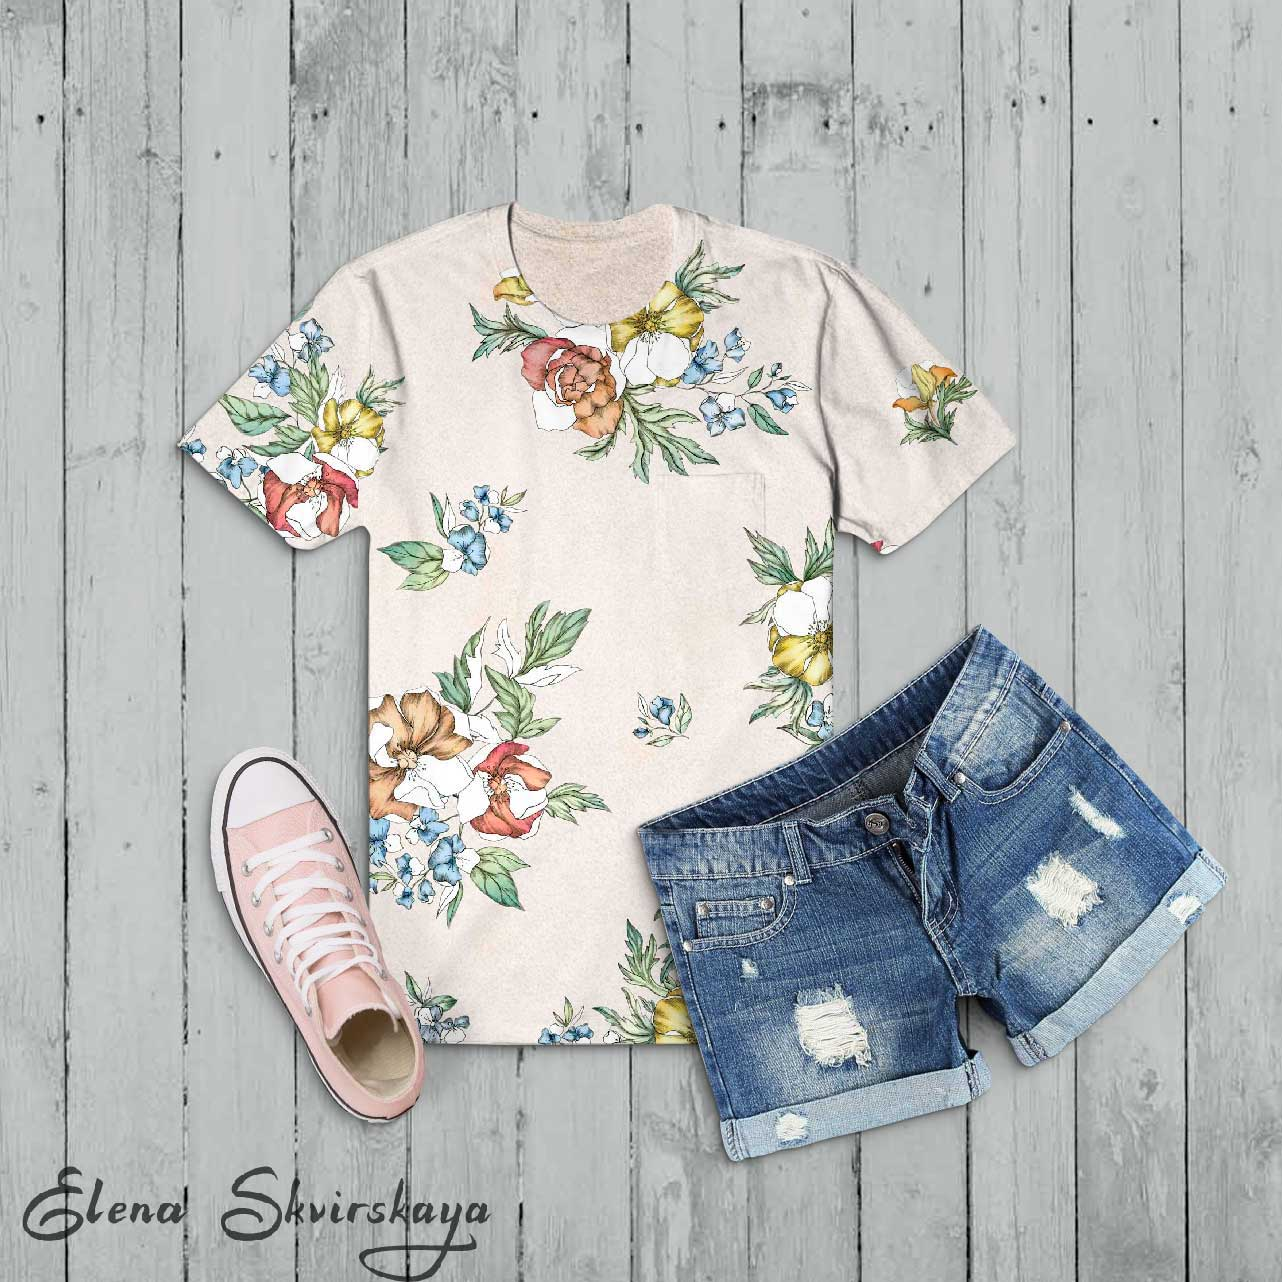 floral design on a t-shirt, unfinished floral style, mock-up